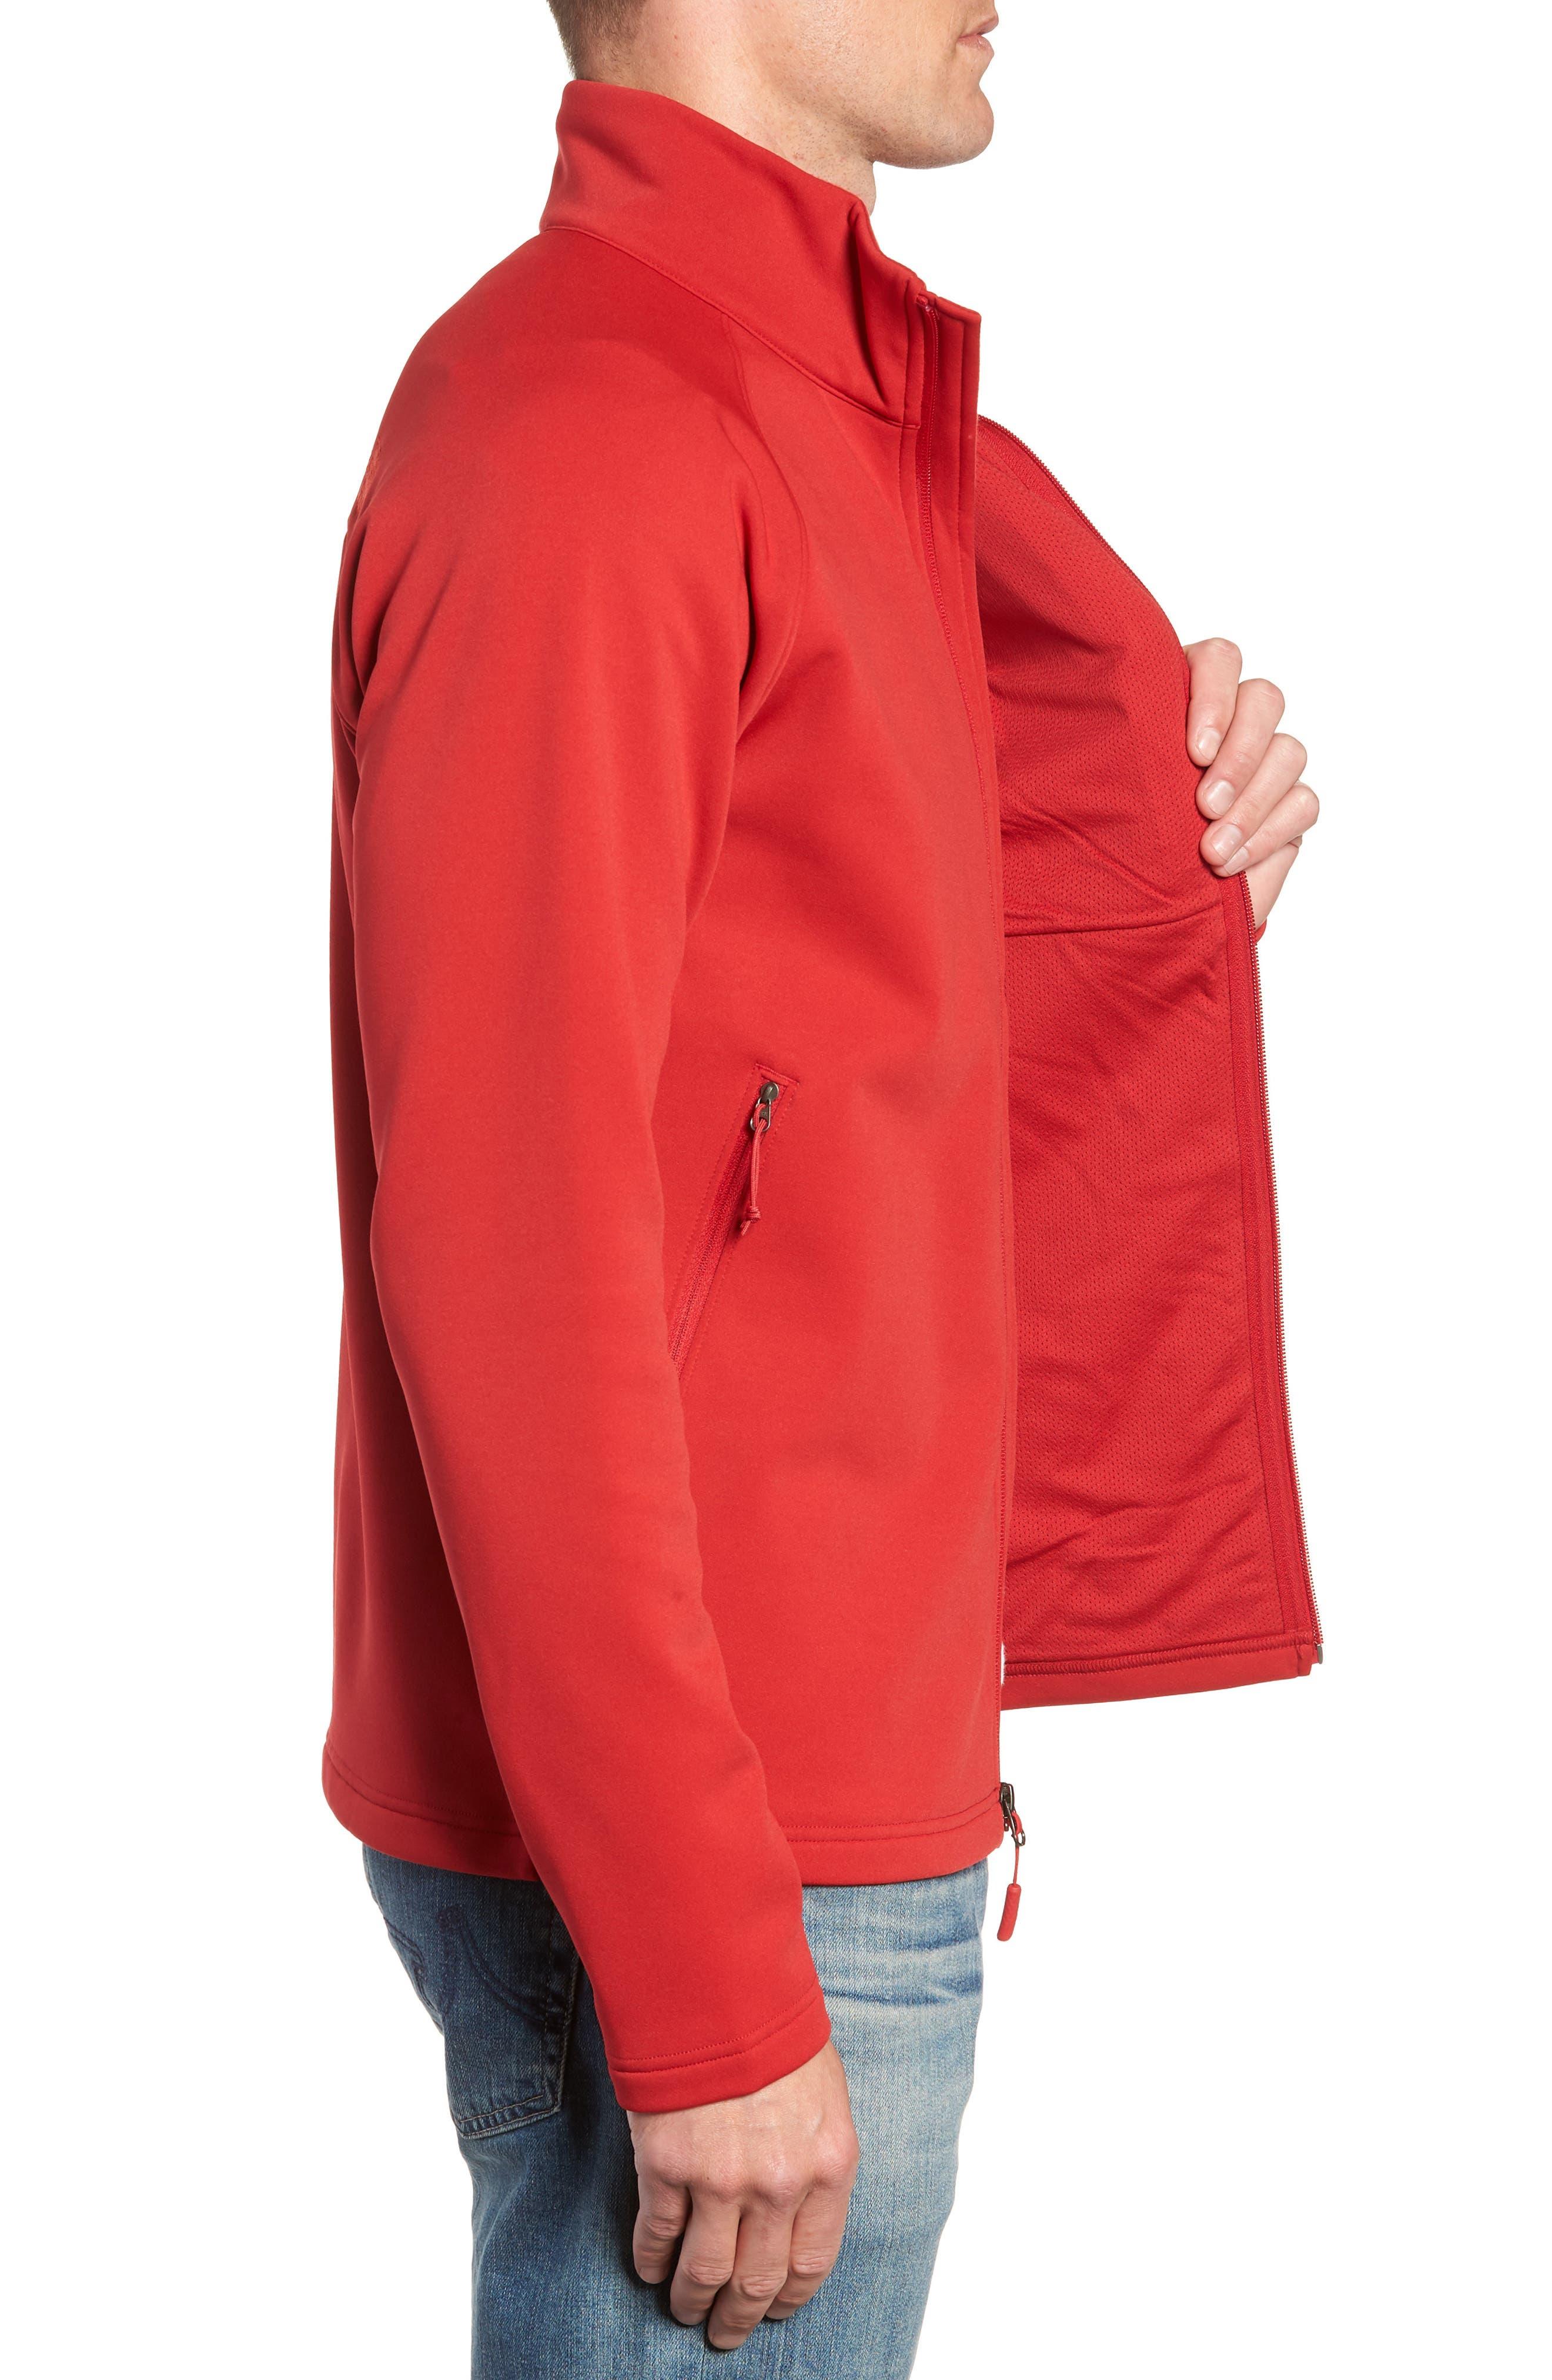 Tenacious Zip Jacket,                             Alternate thumbnail 3, color,                             RAGE RED